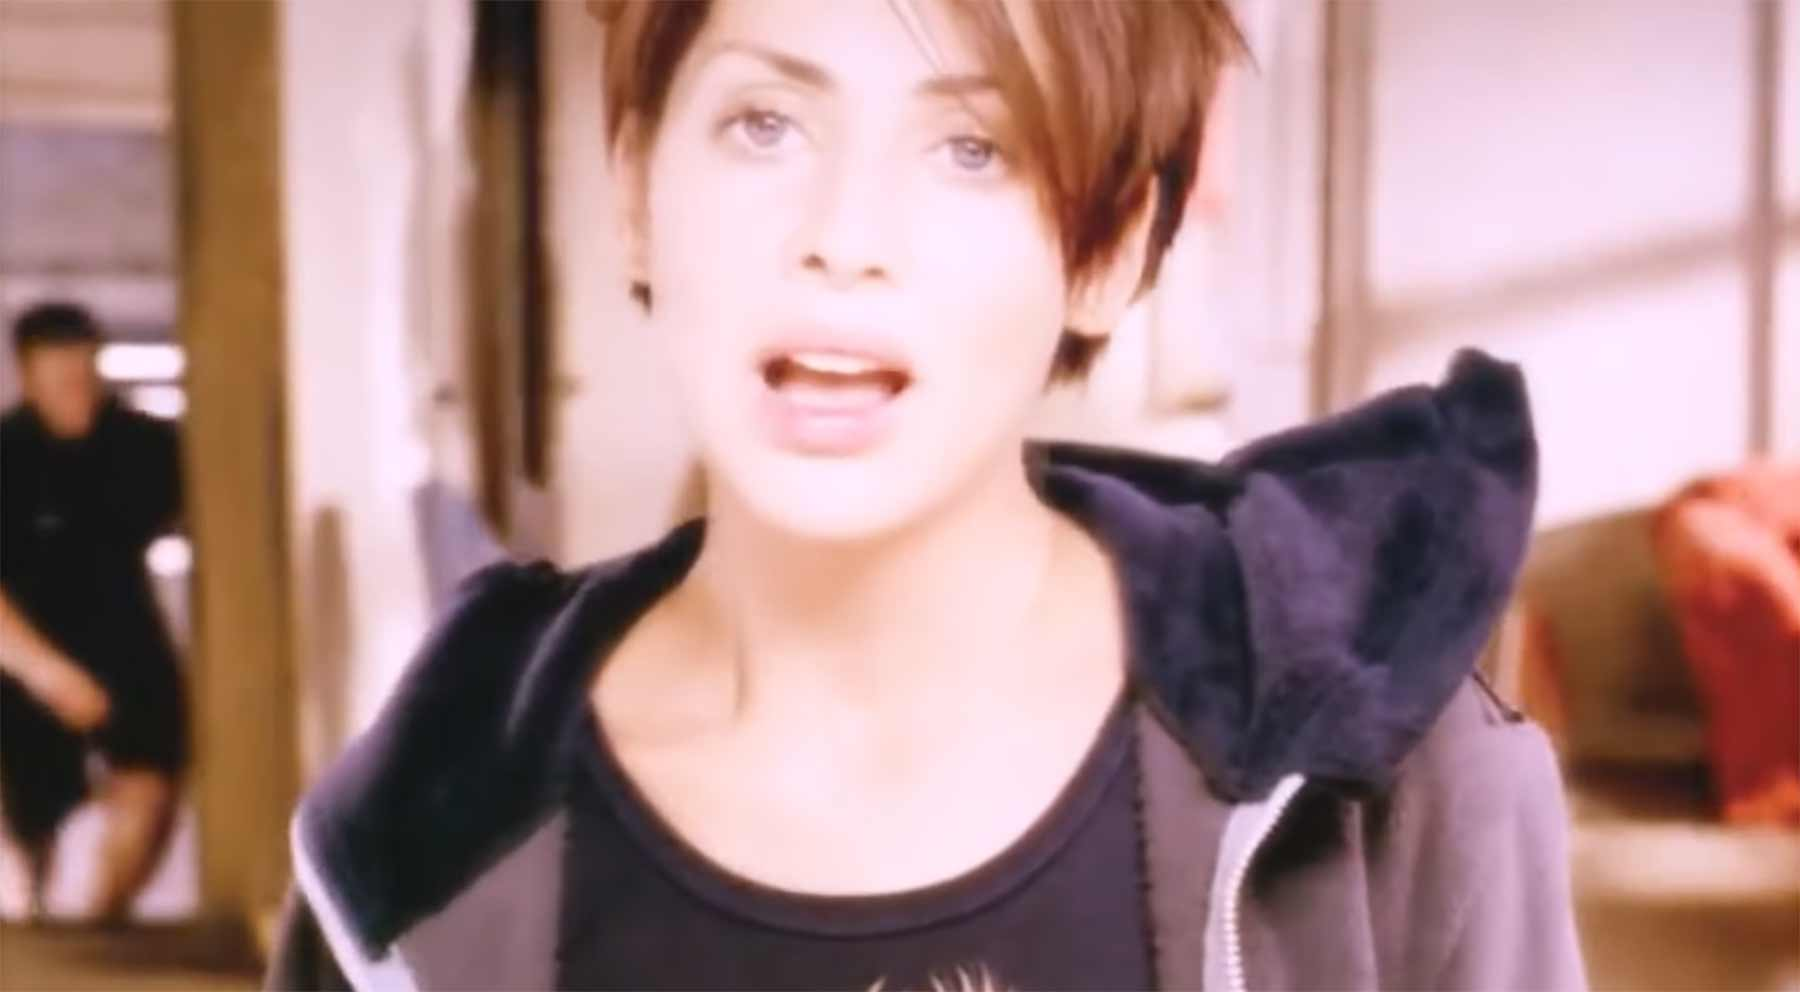 Popkultur vor genau 20 Jahren popkultur-nostalgie-februar-1998